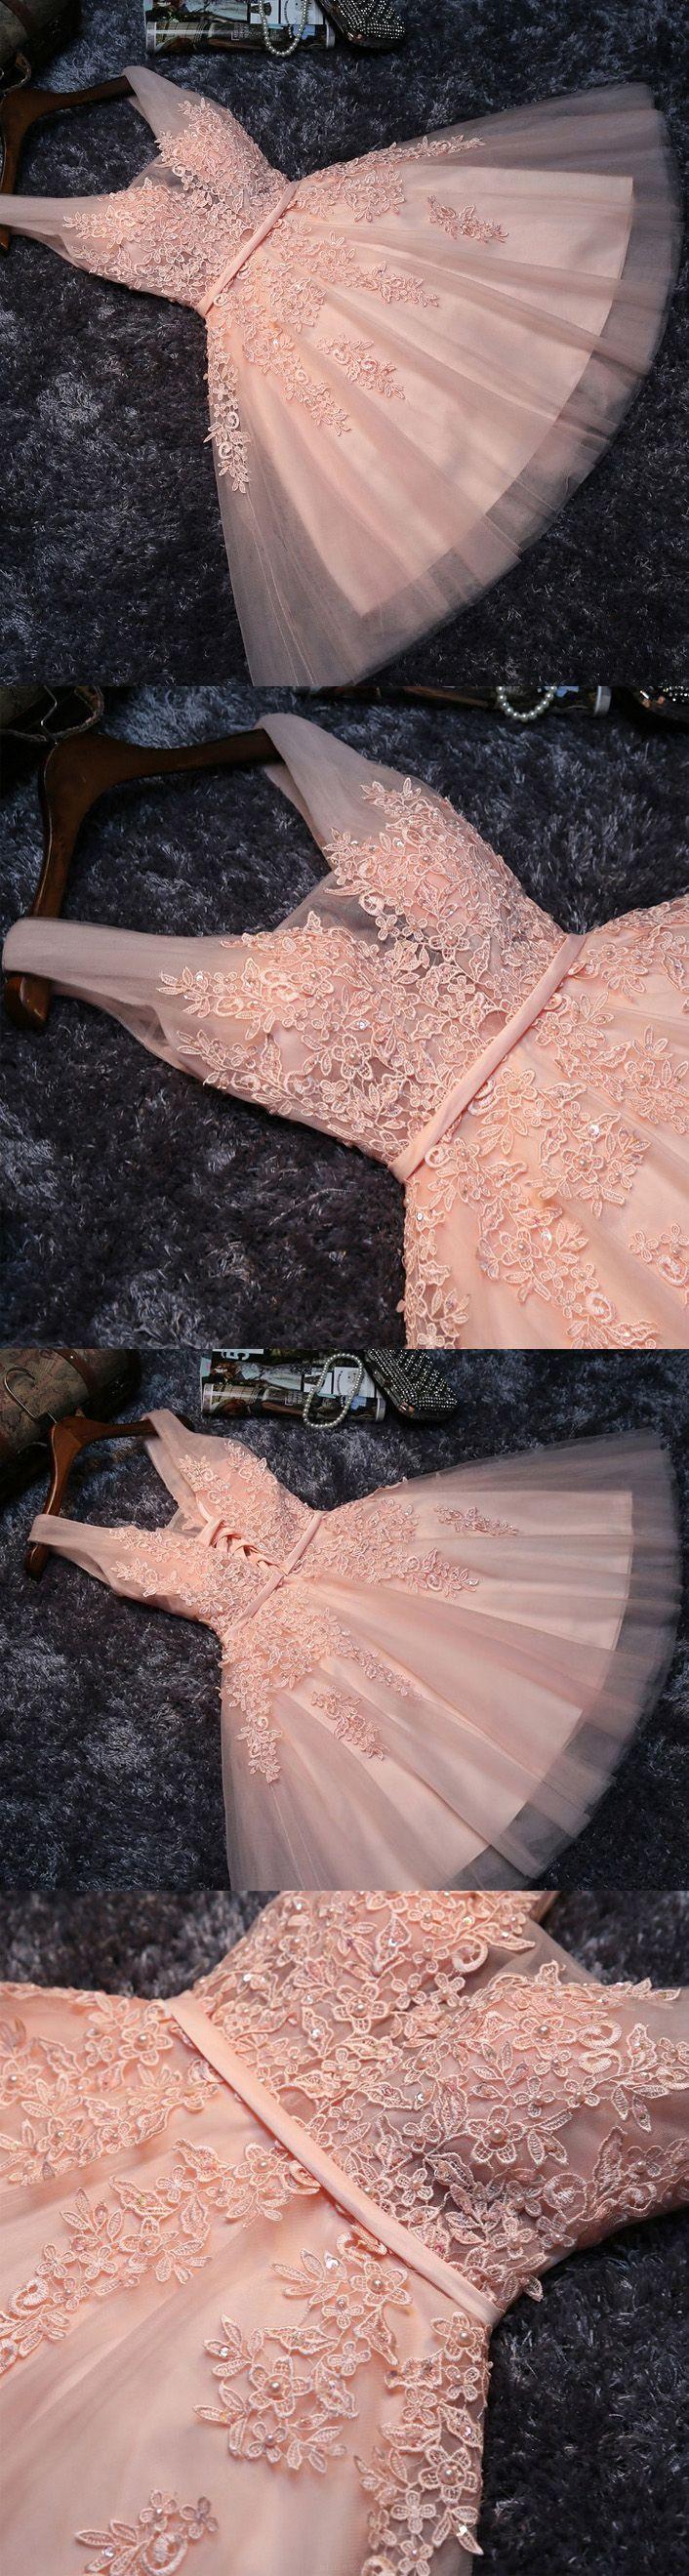 Short Prom Dresses, Lace Prom Dresses, Pink Prom Dresses, Beautiful Prom Dresses, Prom Dresses Short, Lace Homecoming Dresses, A Line Prom Dresses, Prom dresses Sale, Hot Pink Prom Dresses, A Line dresses, Hot Pink dresses, Short Homecoming Dresses, Lace Up Party Dresses, Applique Homecoming Dresses, A-line/Princess Prom Dresses, Sleeveless Prom Dresses